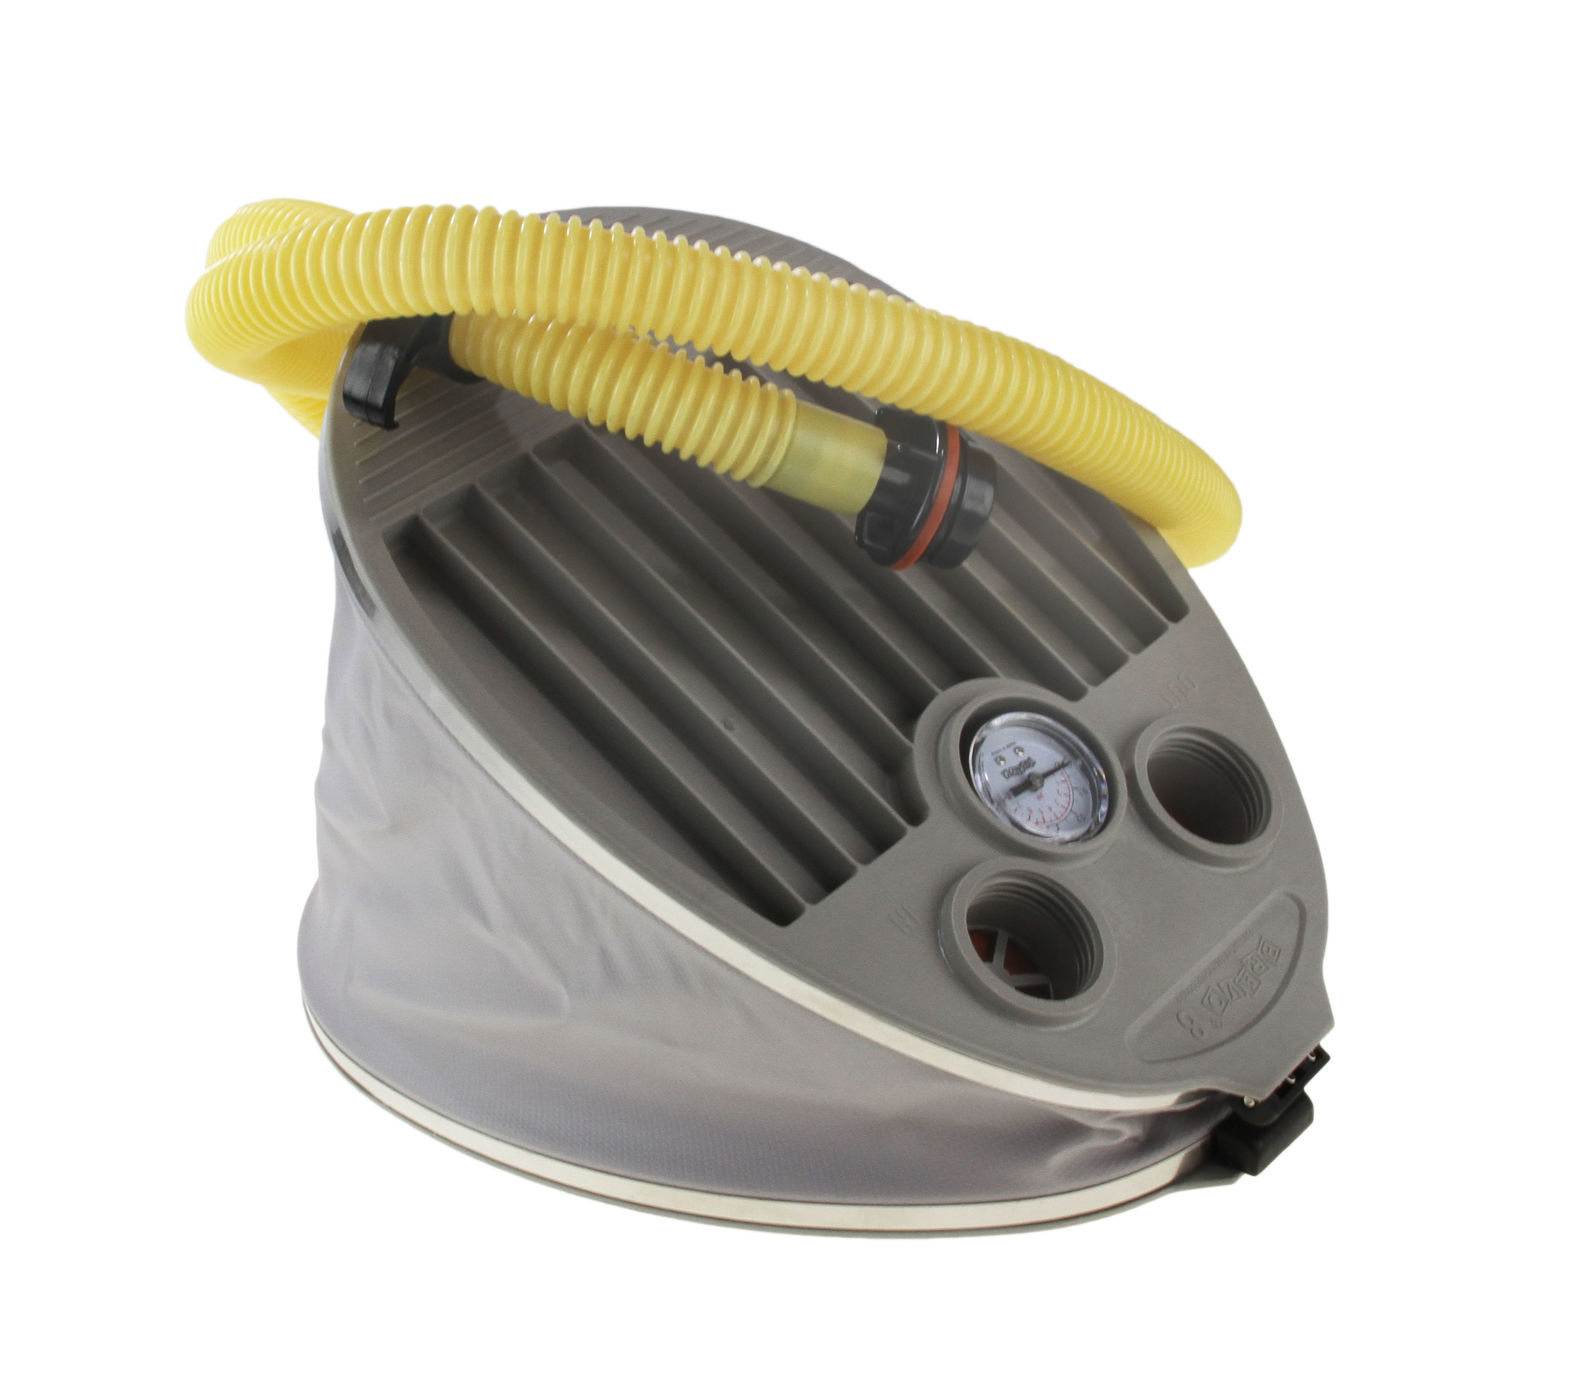 Bravo Pump 8M Foot With Pressure Gauge 6090018